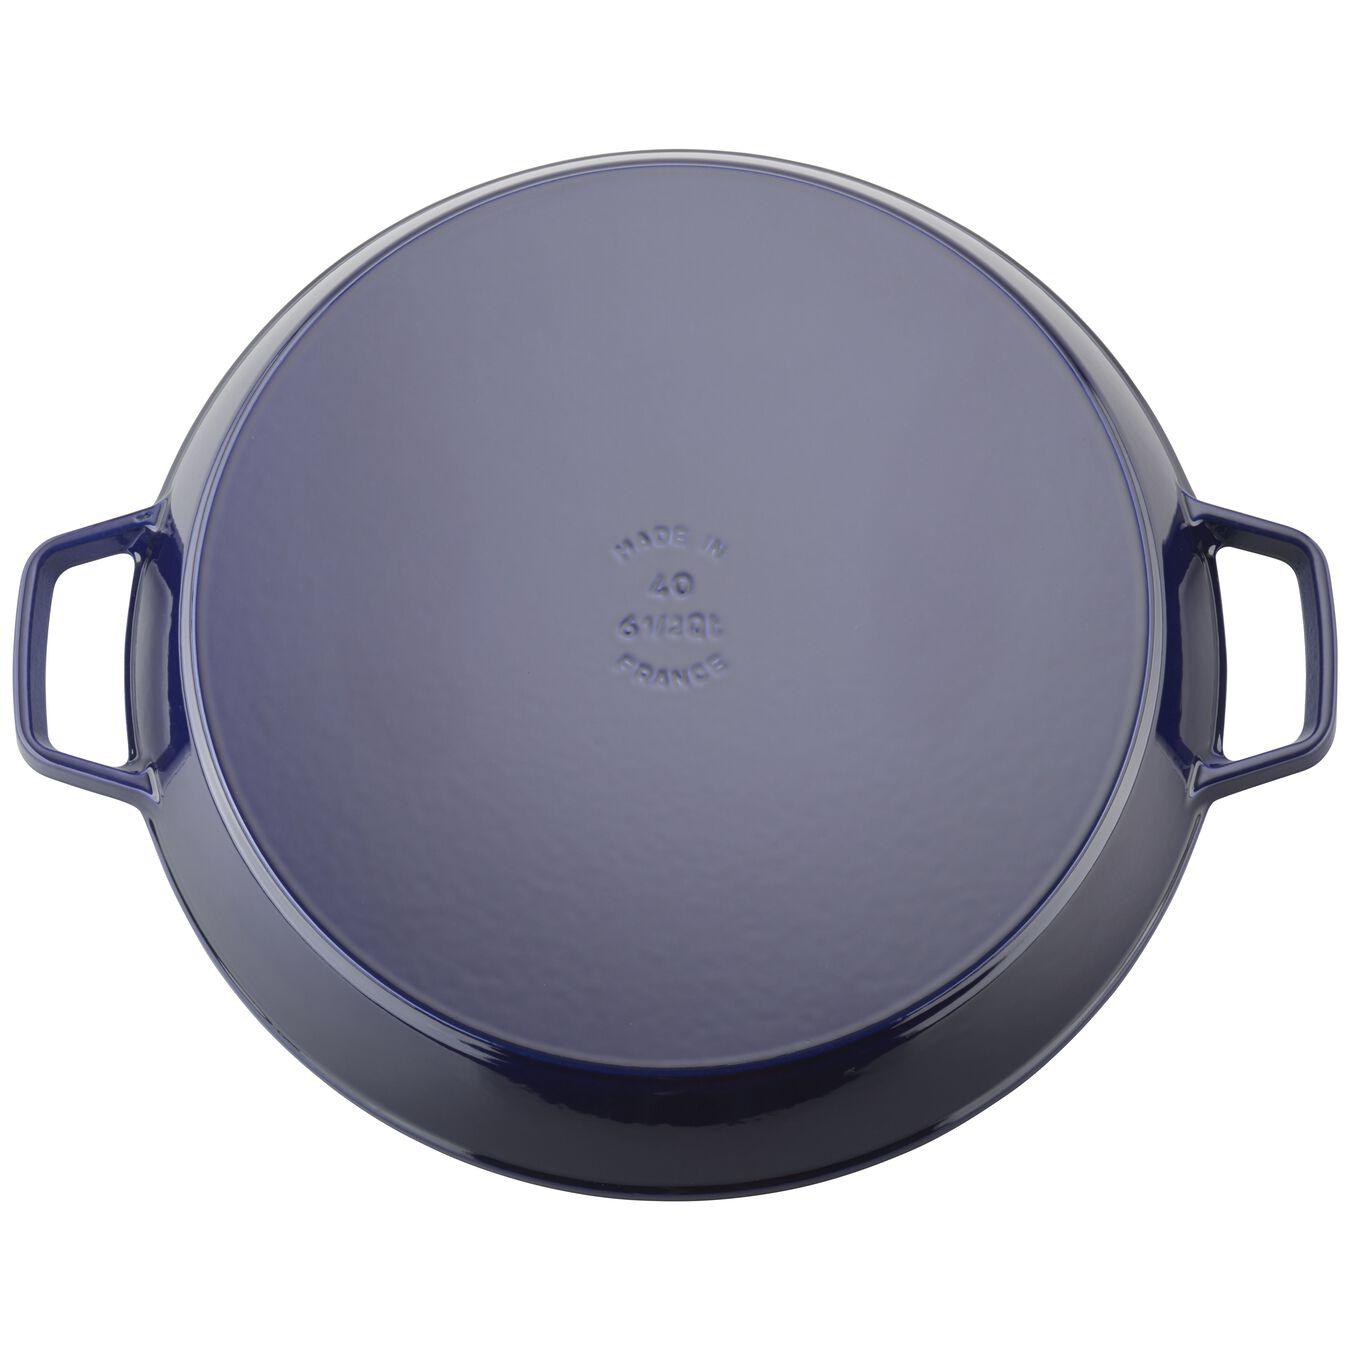 15-inch Double Handle Fry Pan / Paella Pan - Dark Blue,,large 3